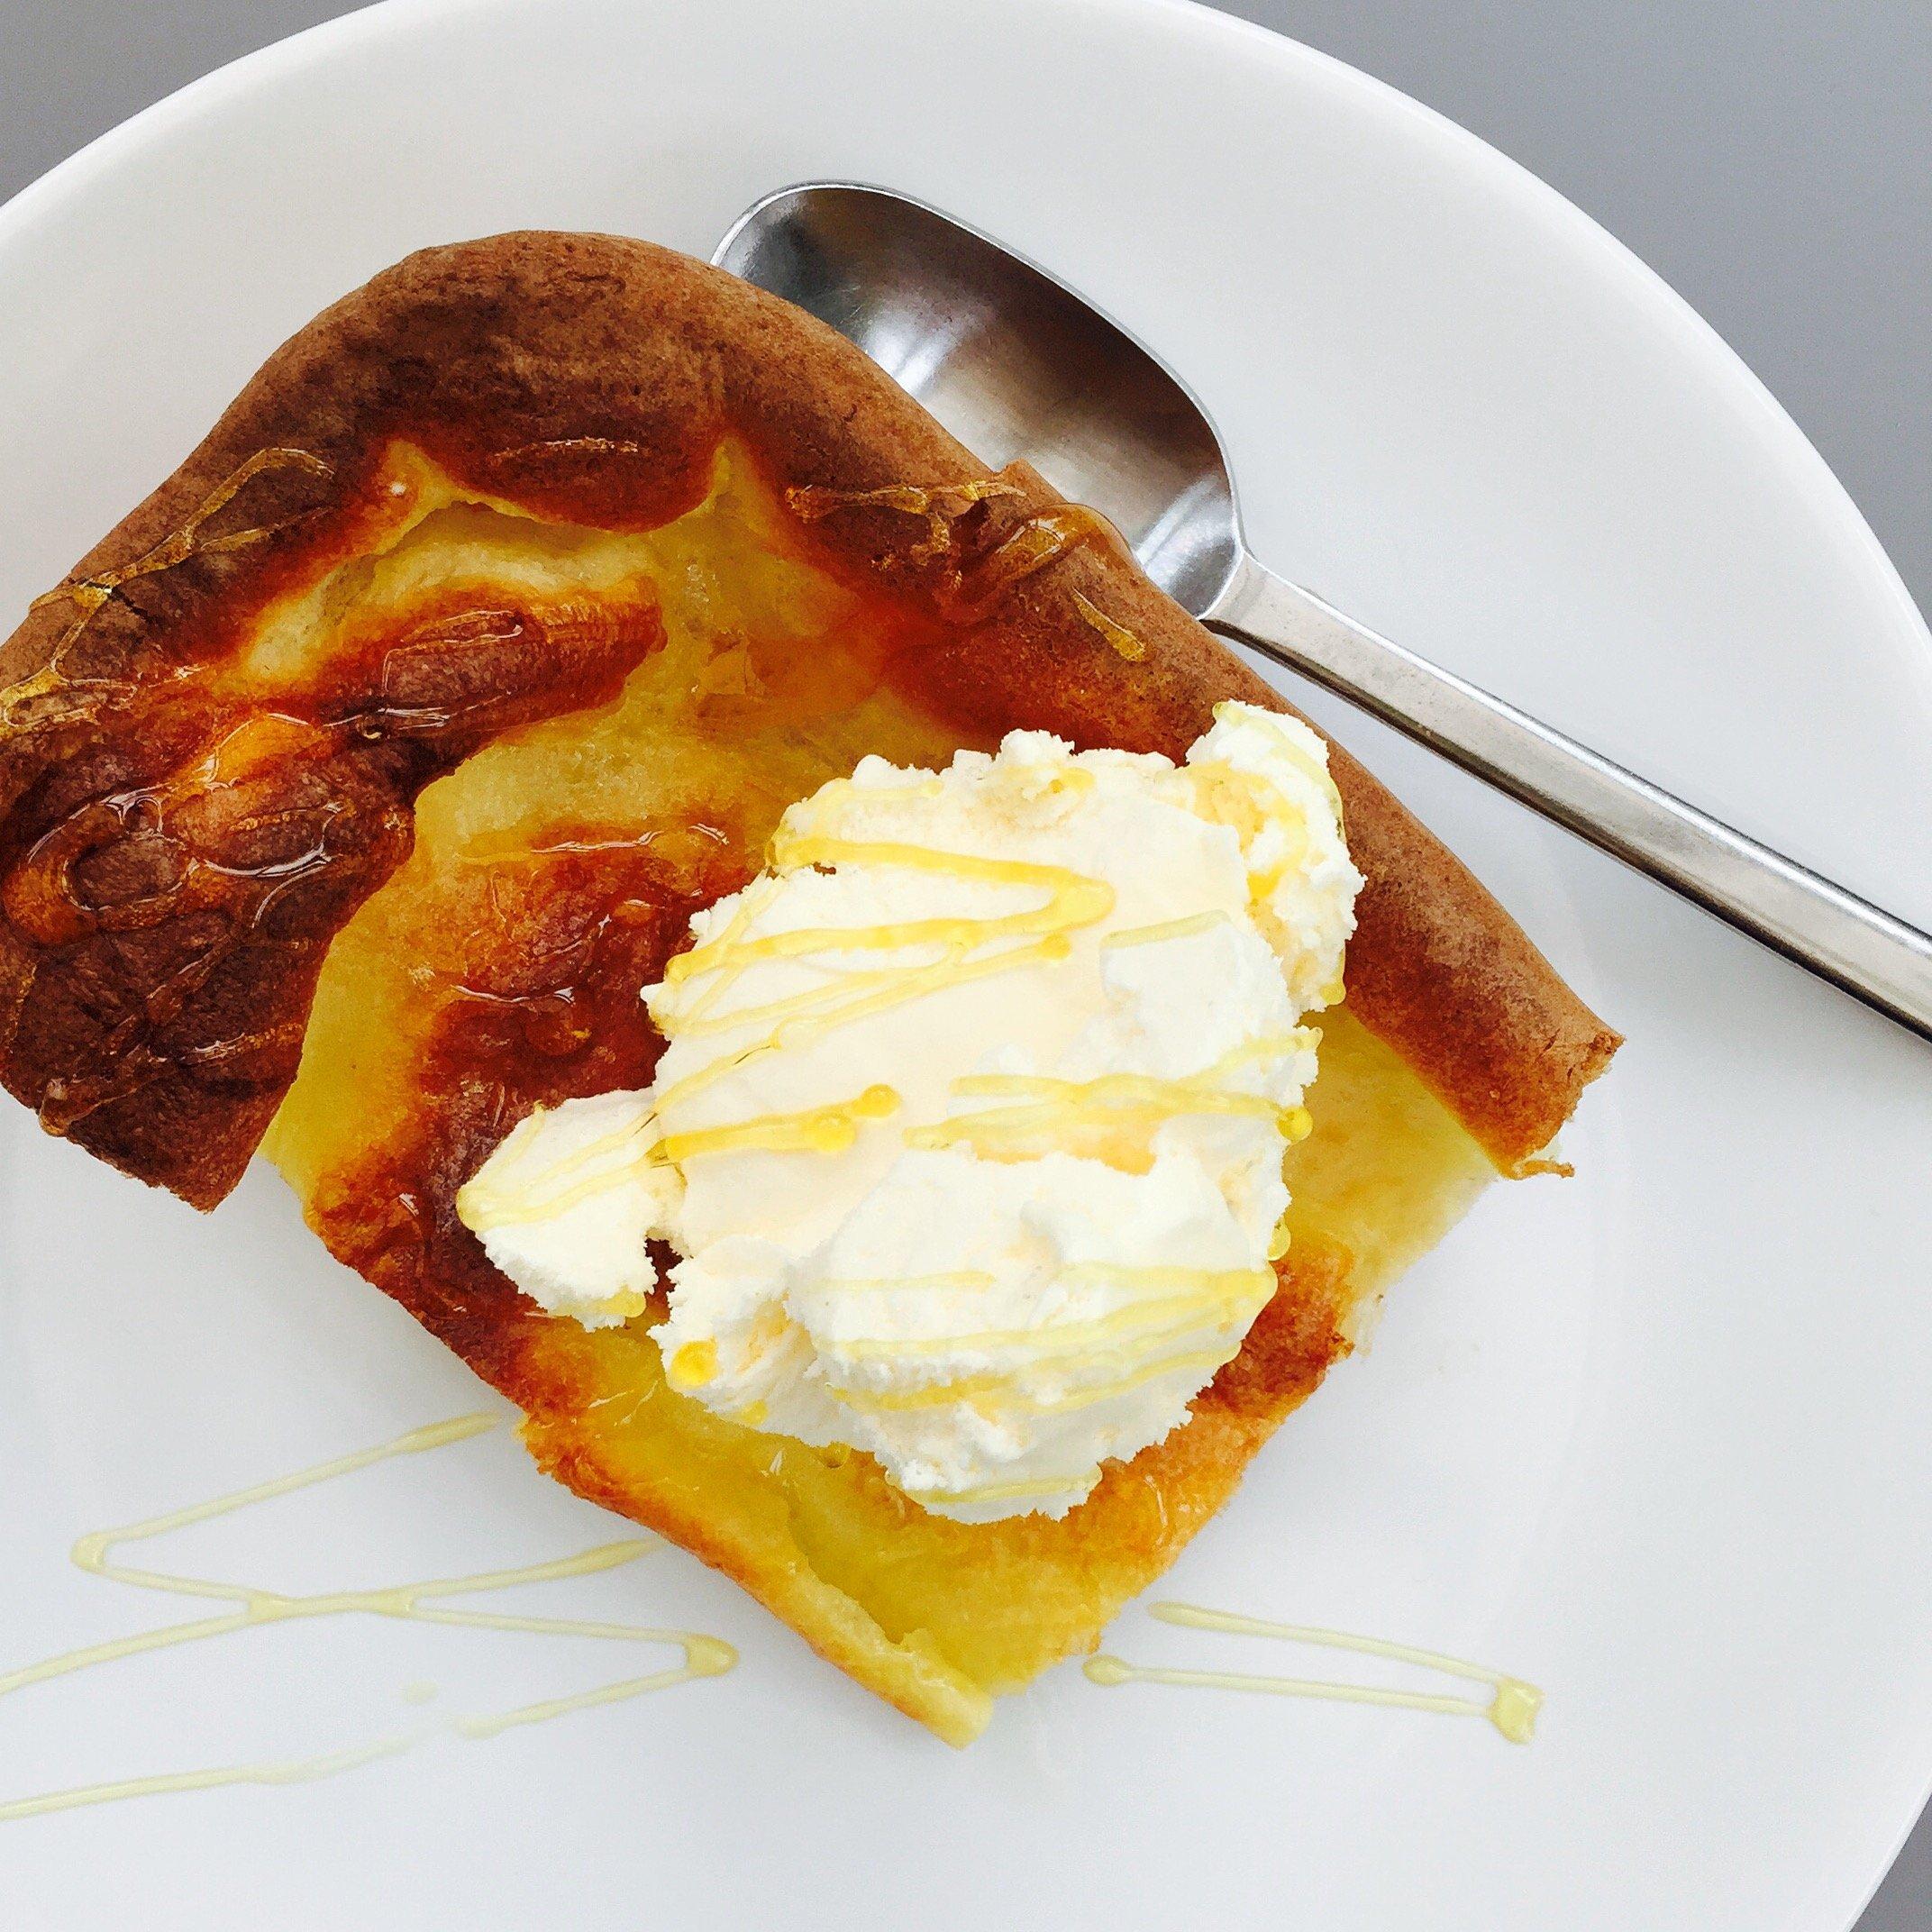 Yorkshire pudding dessert